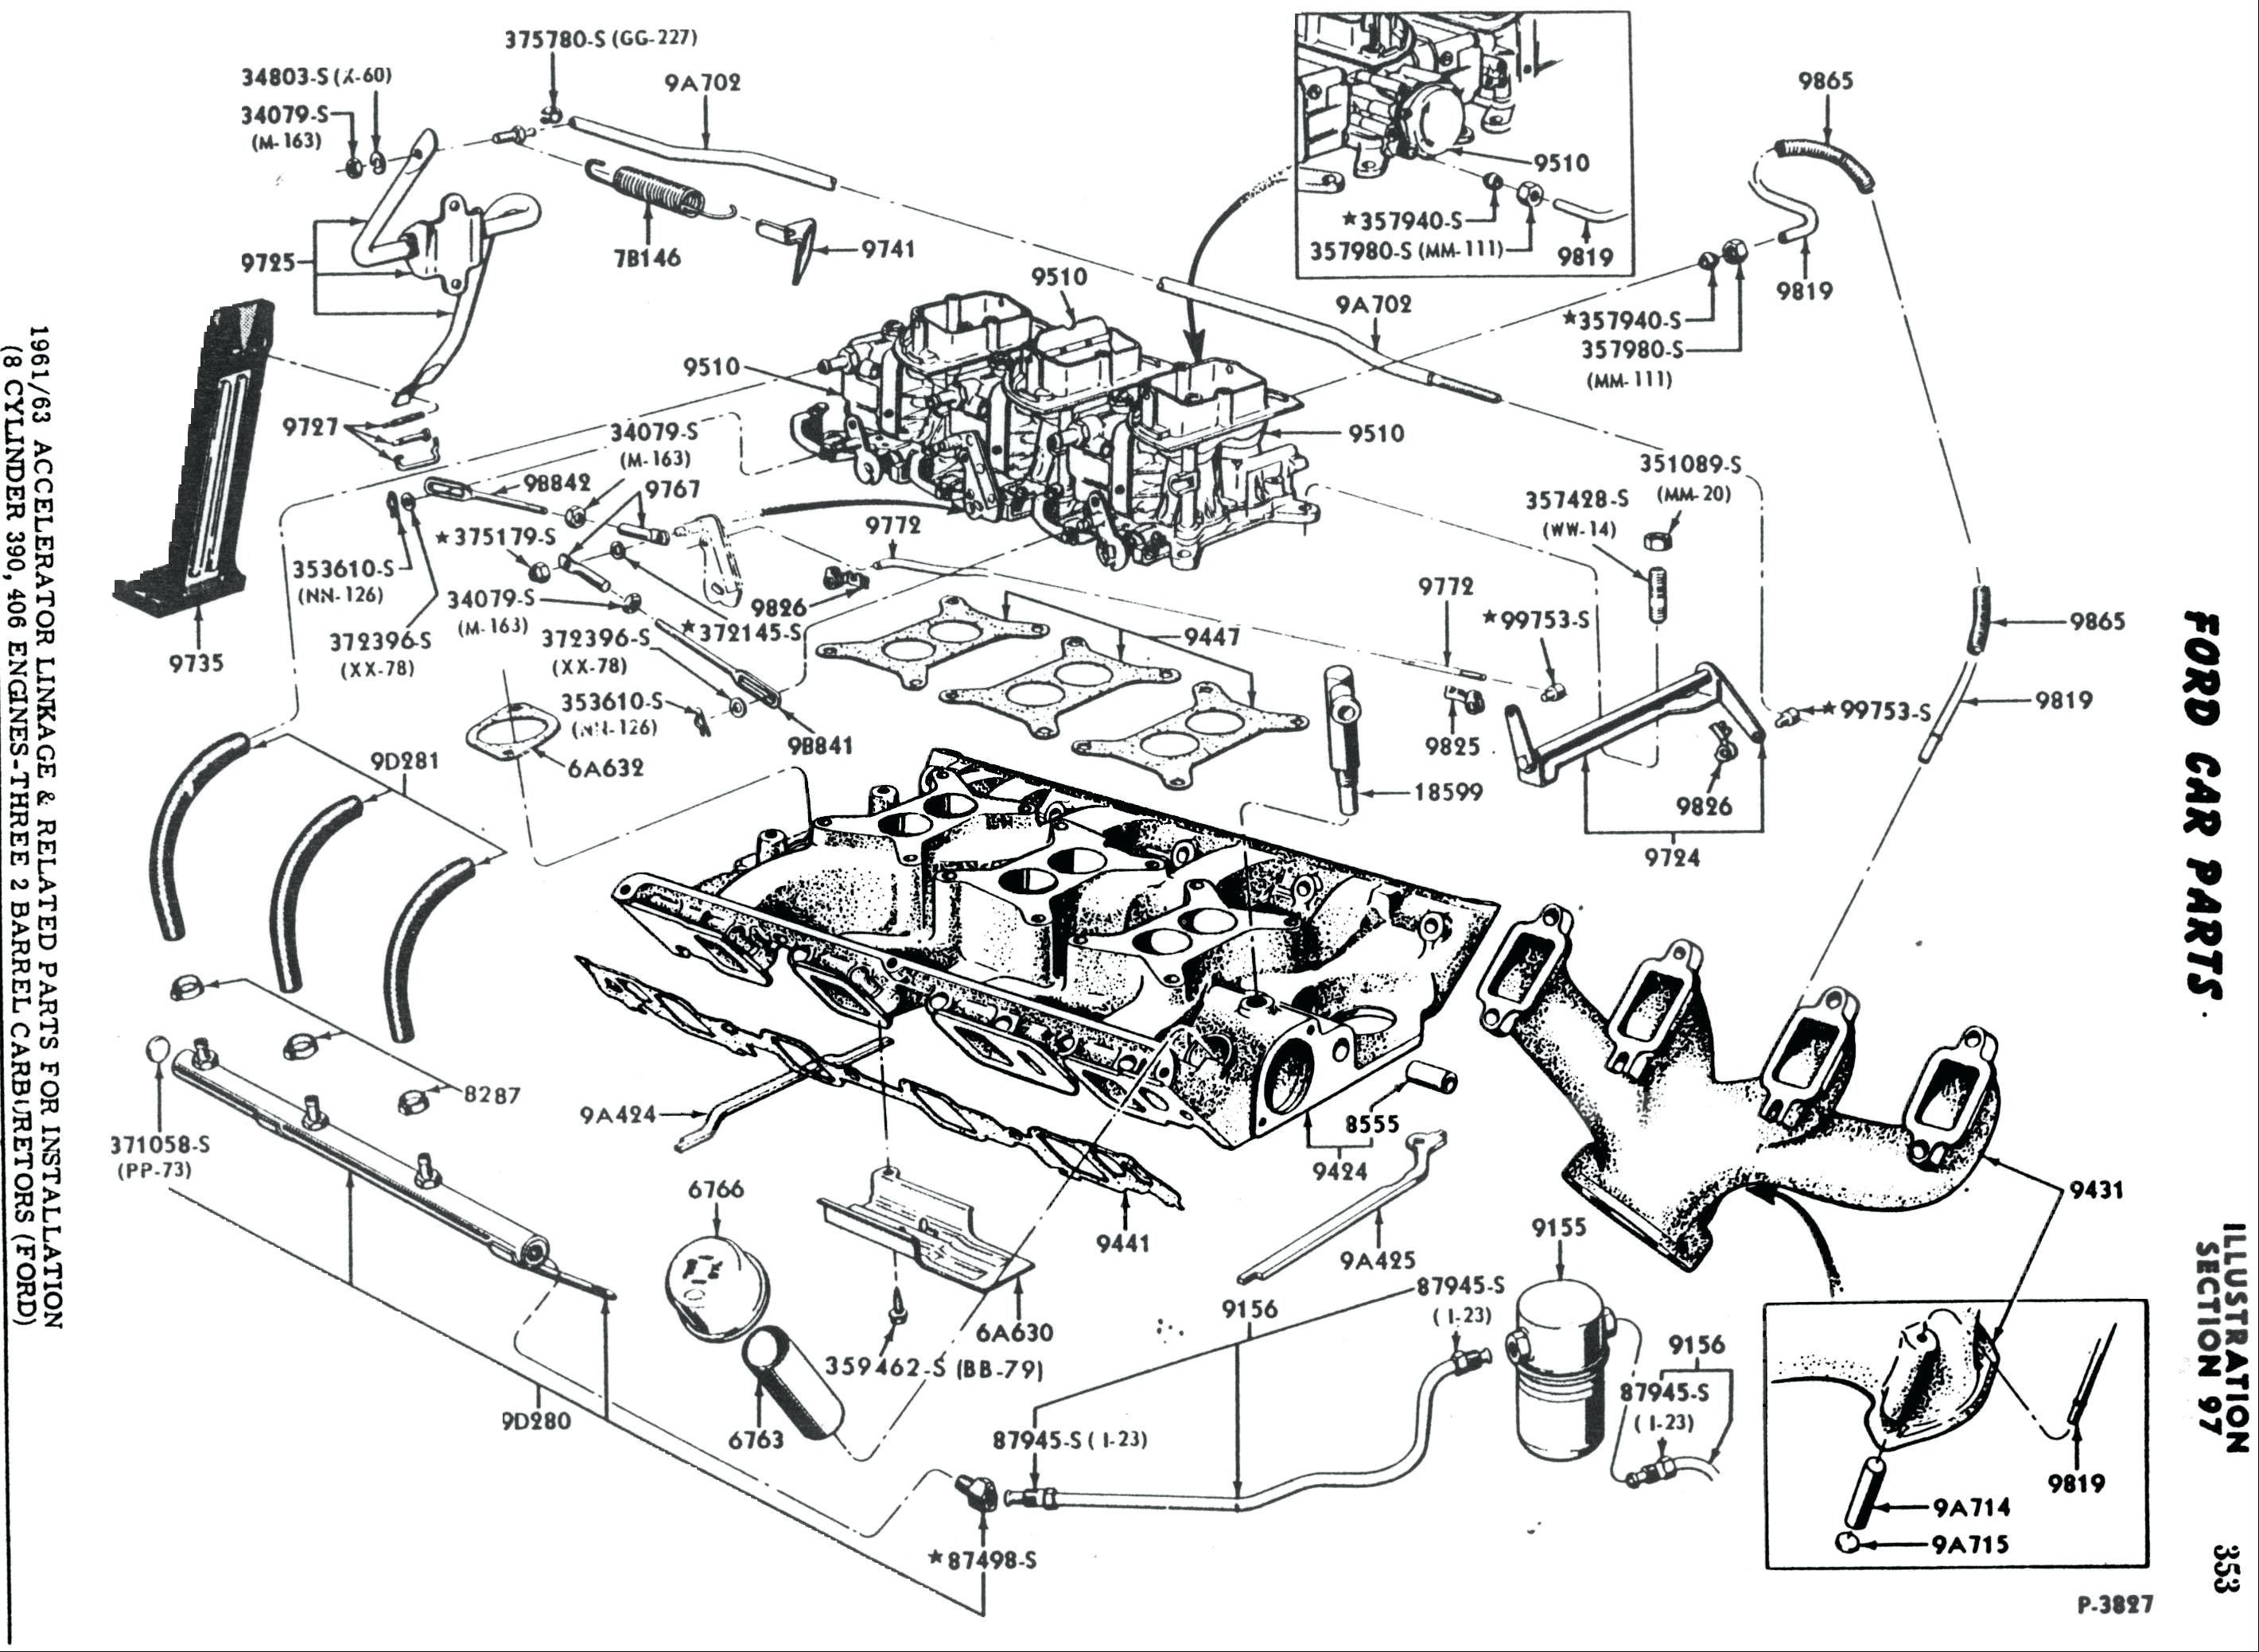 Undercarriage Of A Car Diagram Wrg 7679] Car Engine Schematics